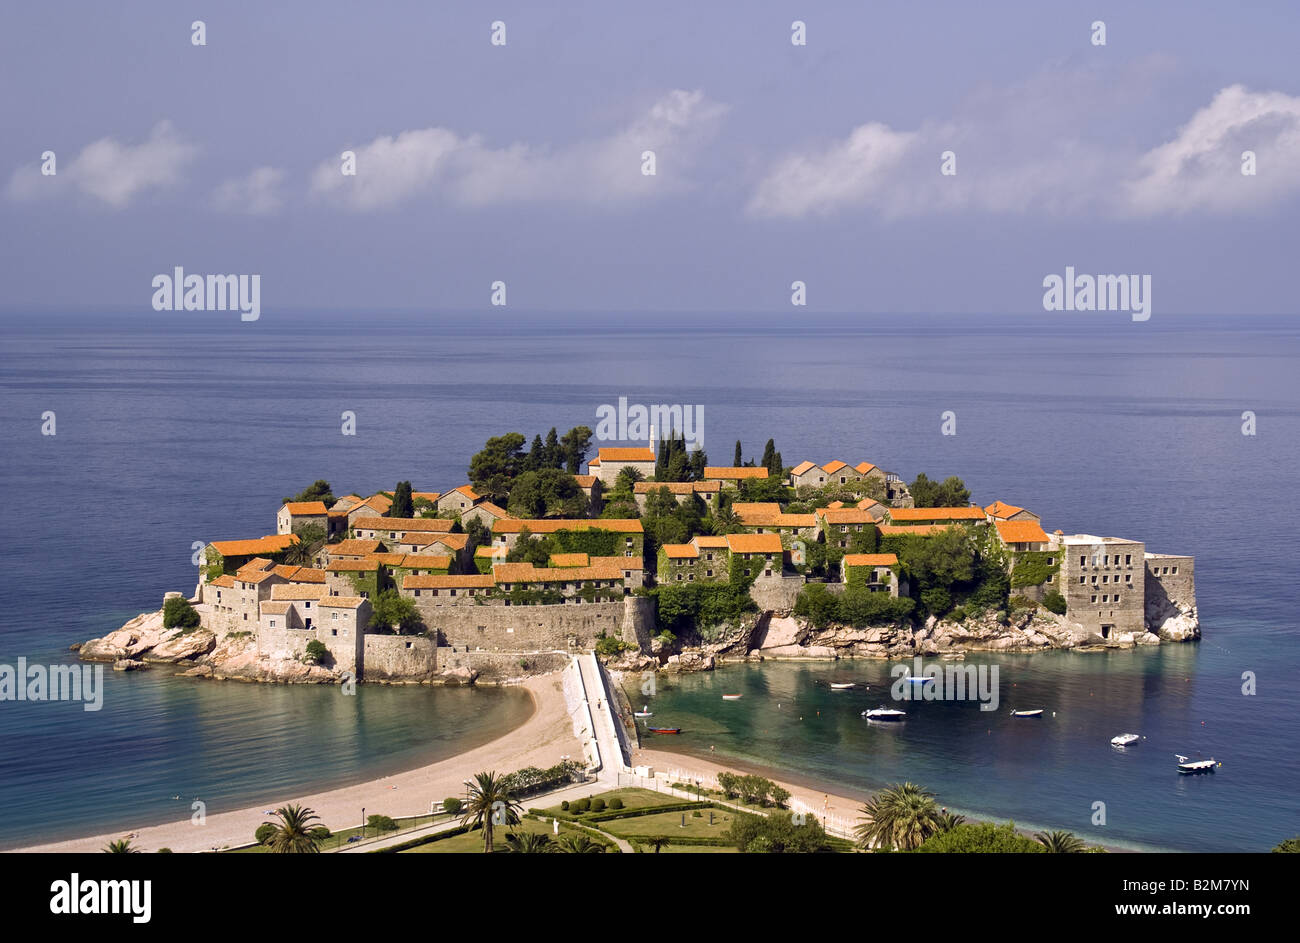 Sveti Stefan, exclusive island luxury resort hotel, on Budva Riviera of Adriatic Sea - Stock Image